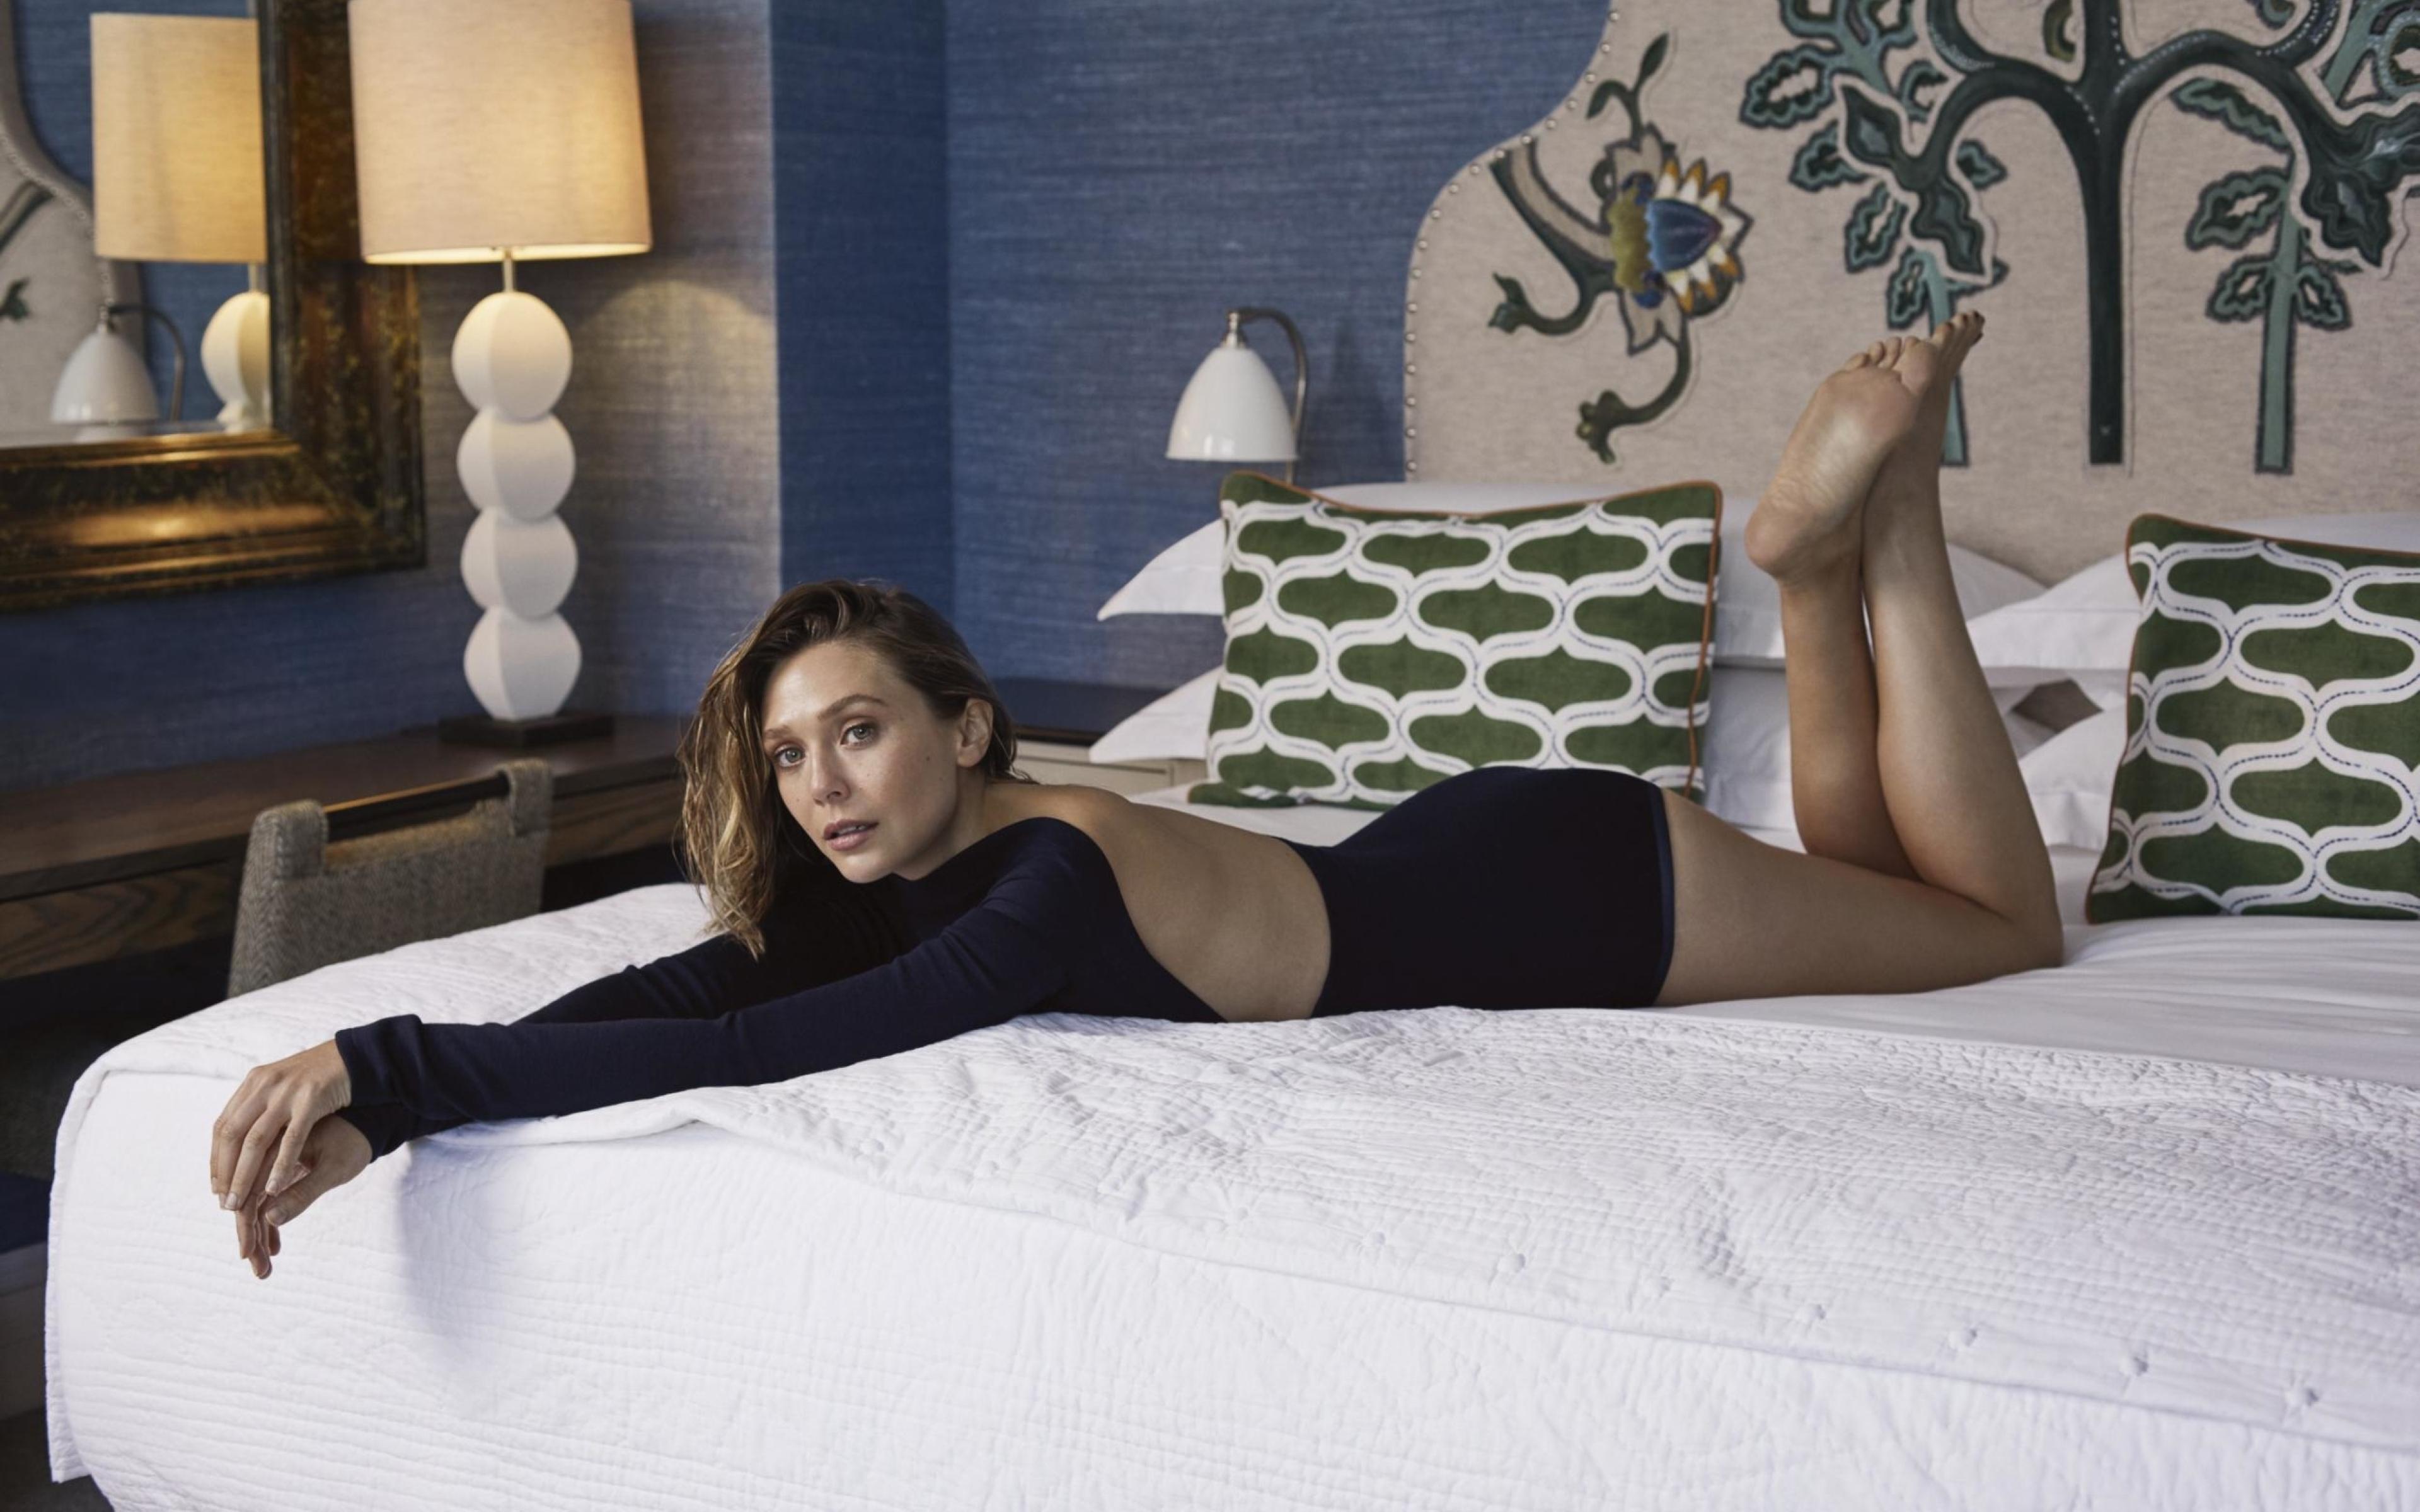 Hot Elizabeth Olsen Backless In Bed Full Hd 2k Wallpaper